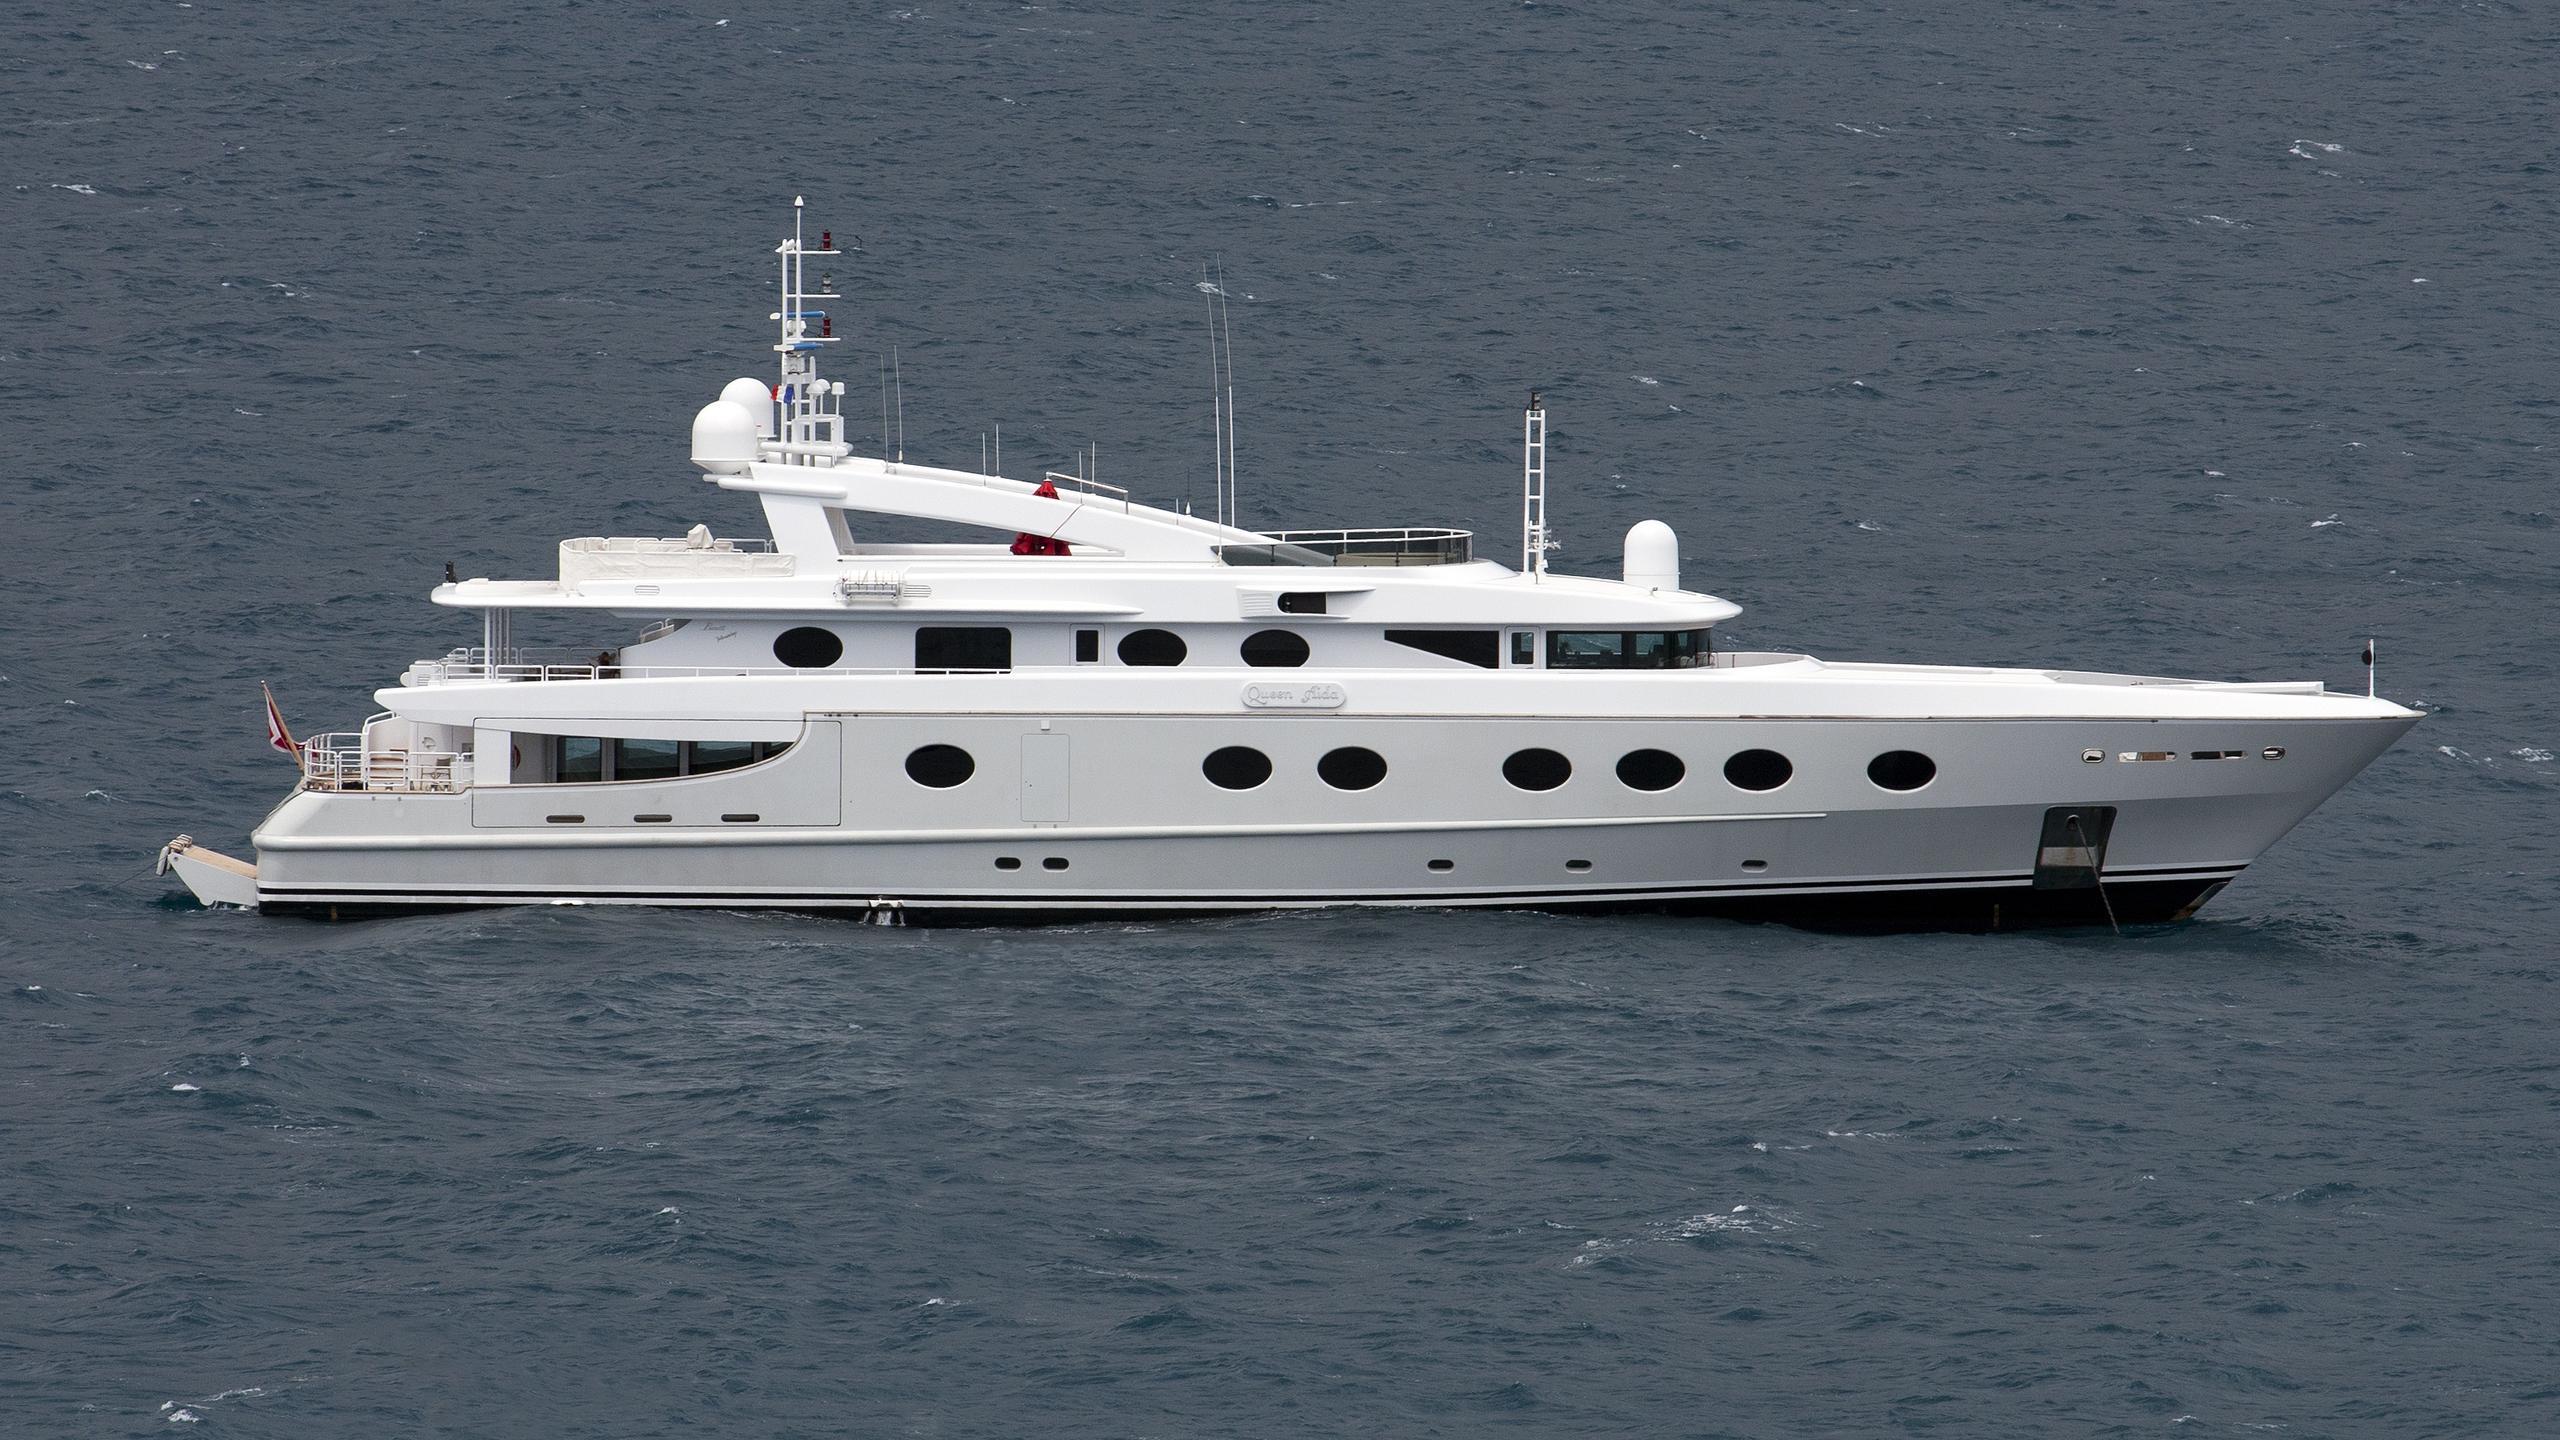 queen-aida-motor-yacht-benetti-2002-50m-profile